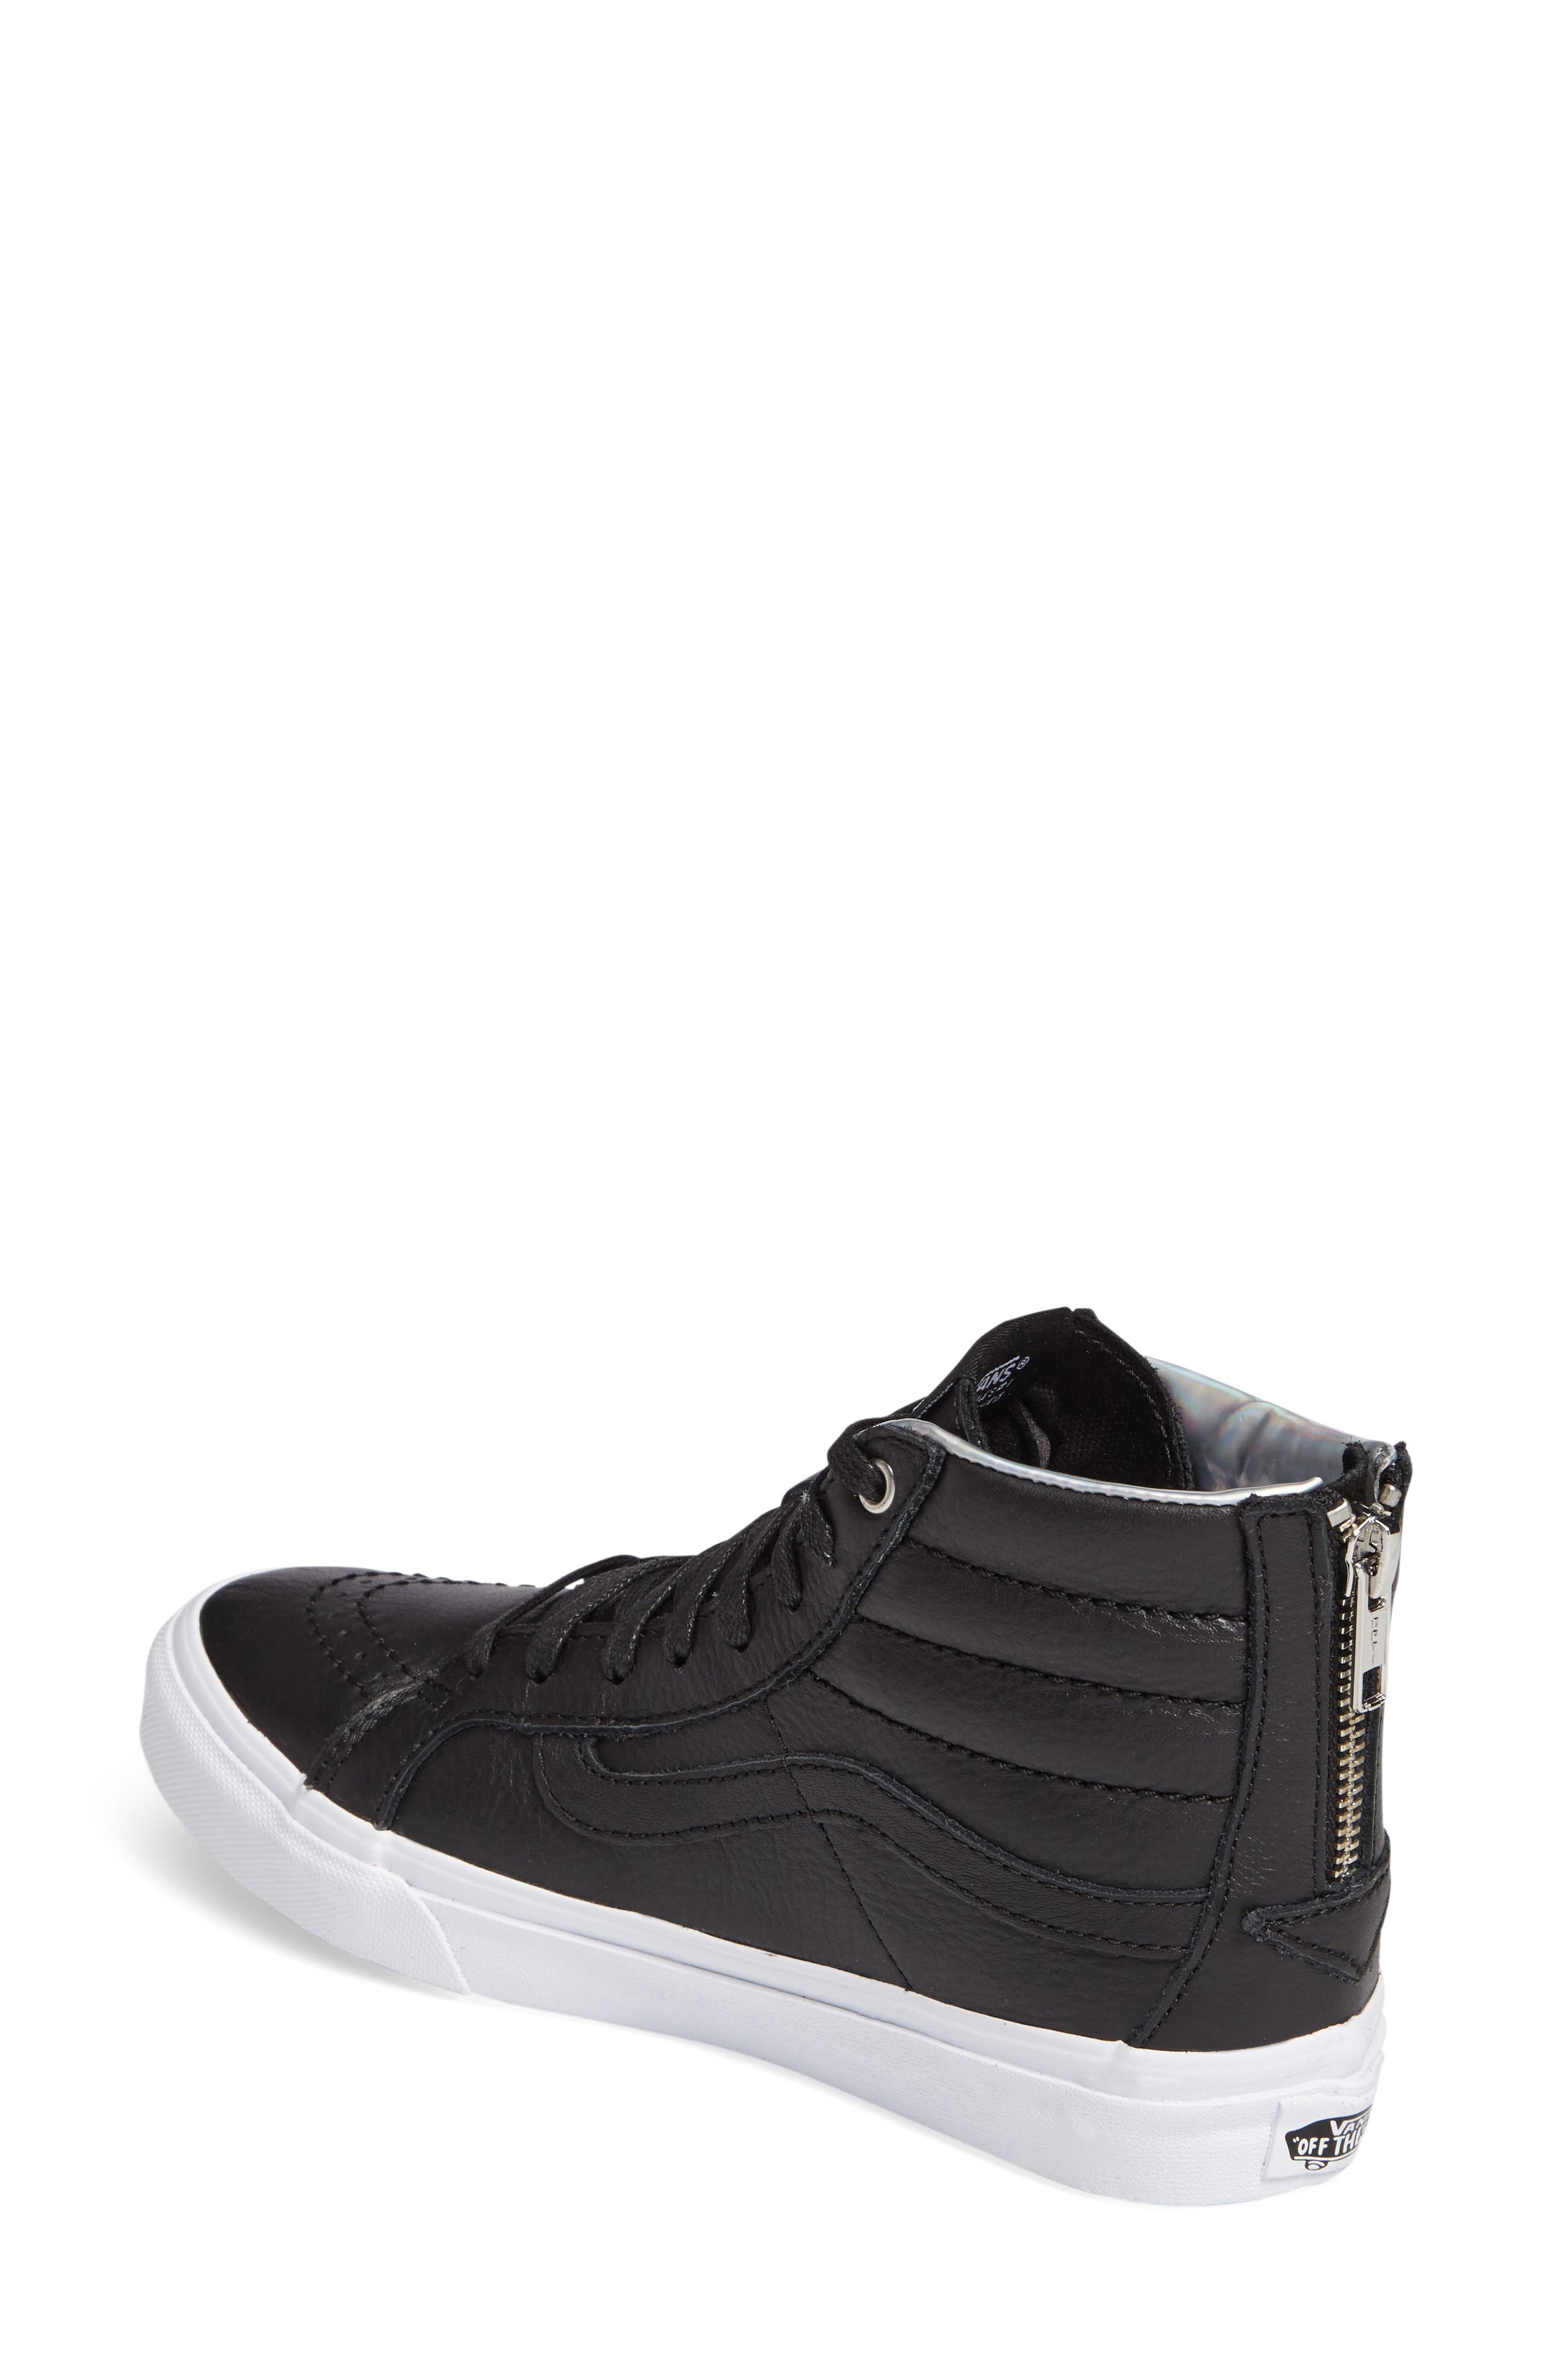 Alternate Image 2  - Vans 'Sk8-Hi Slim' Metallic Leather Sneaker (Women)